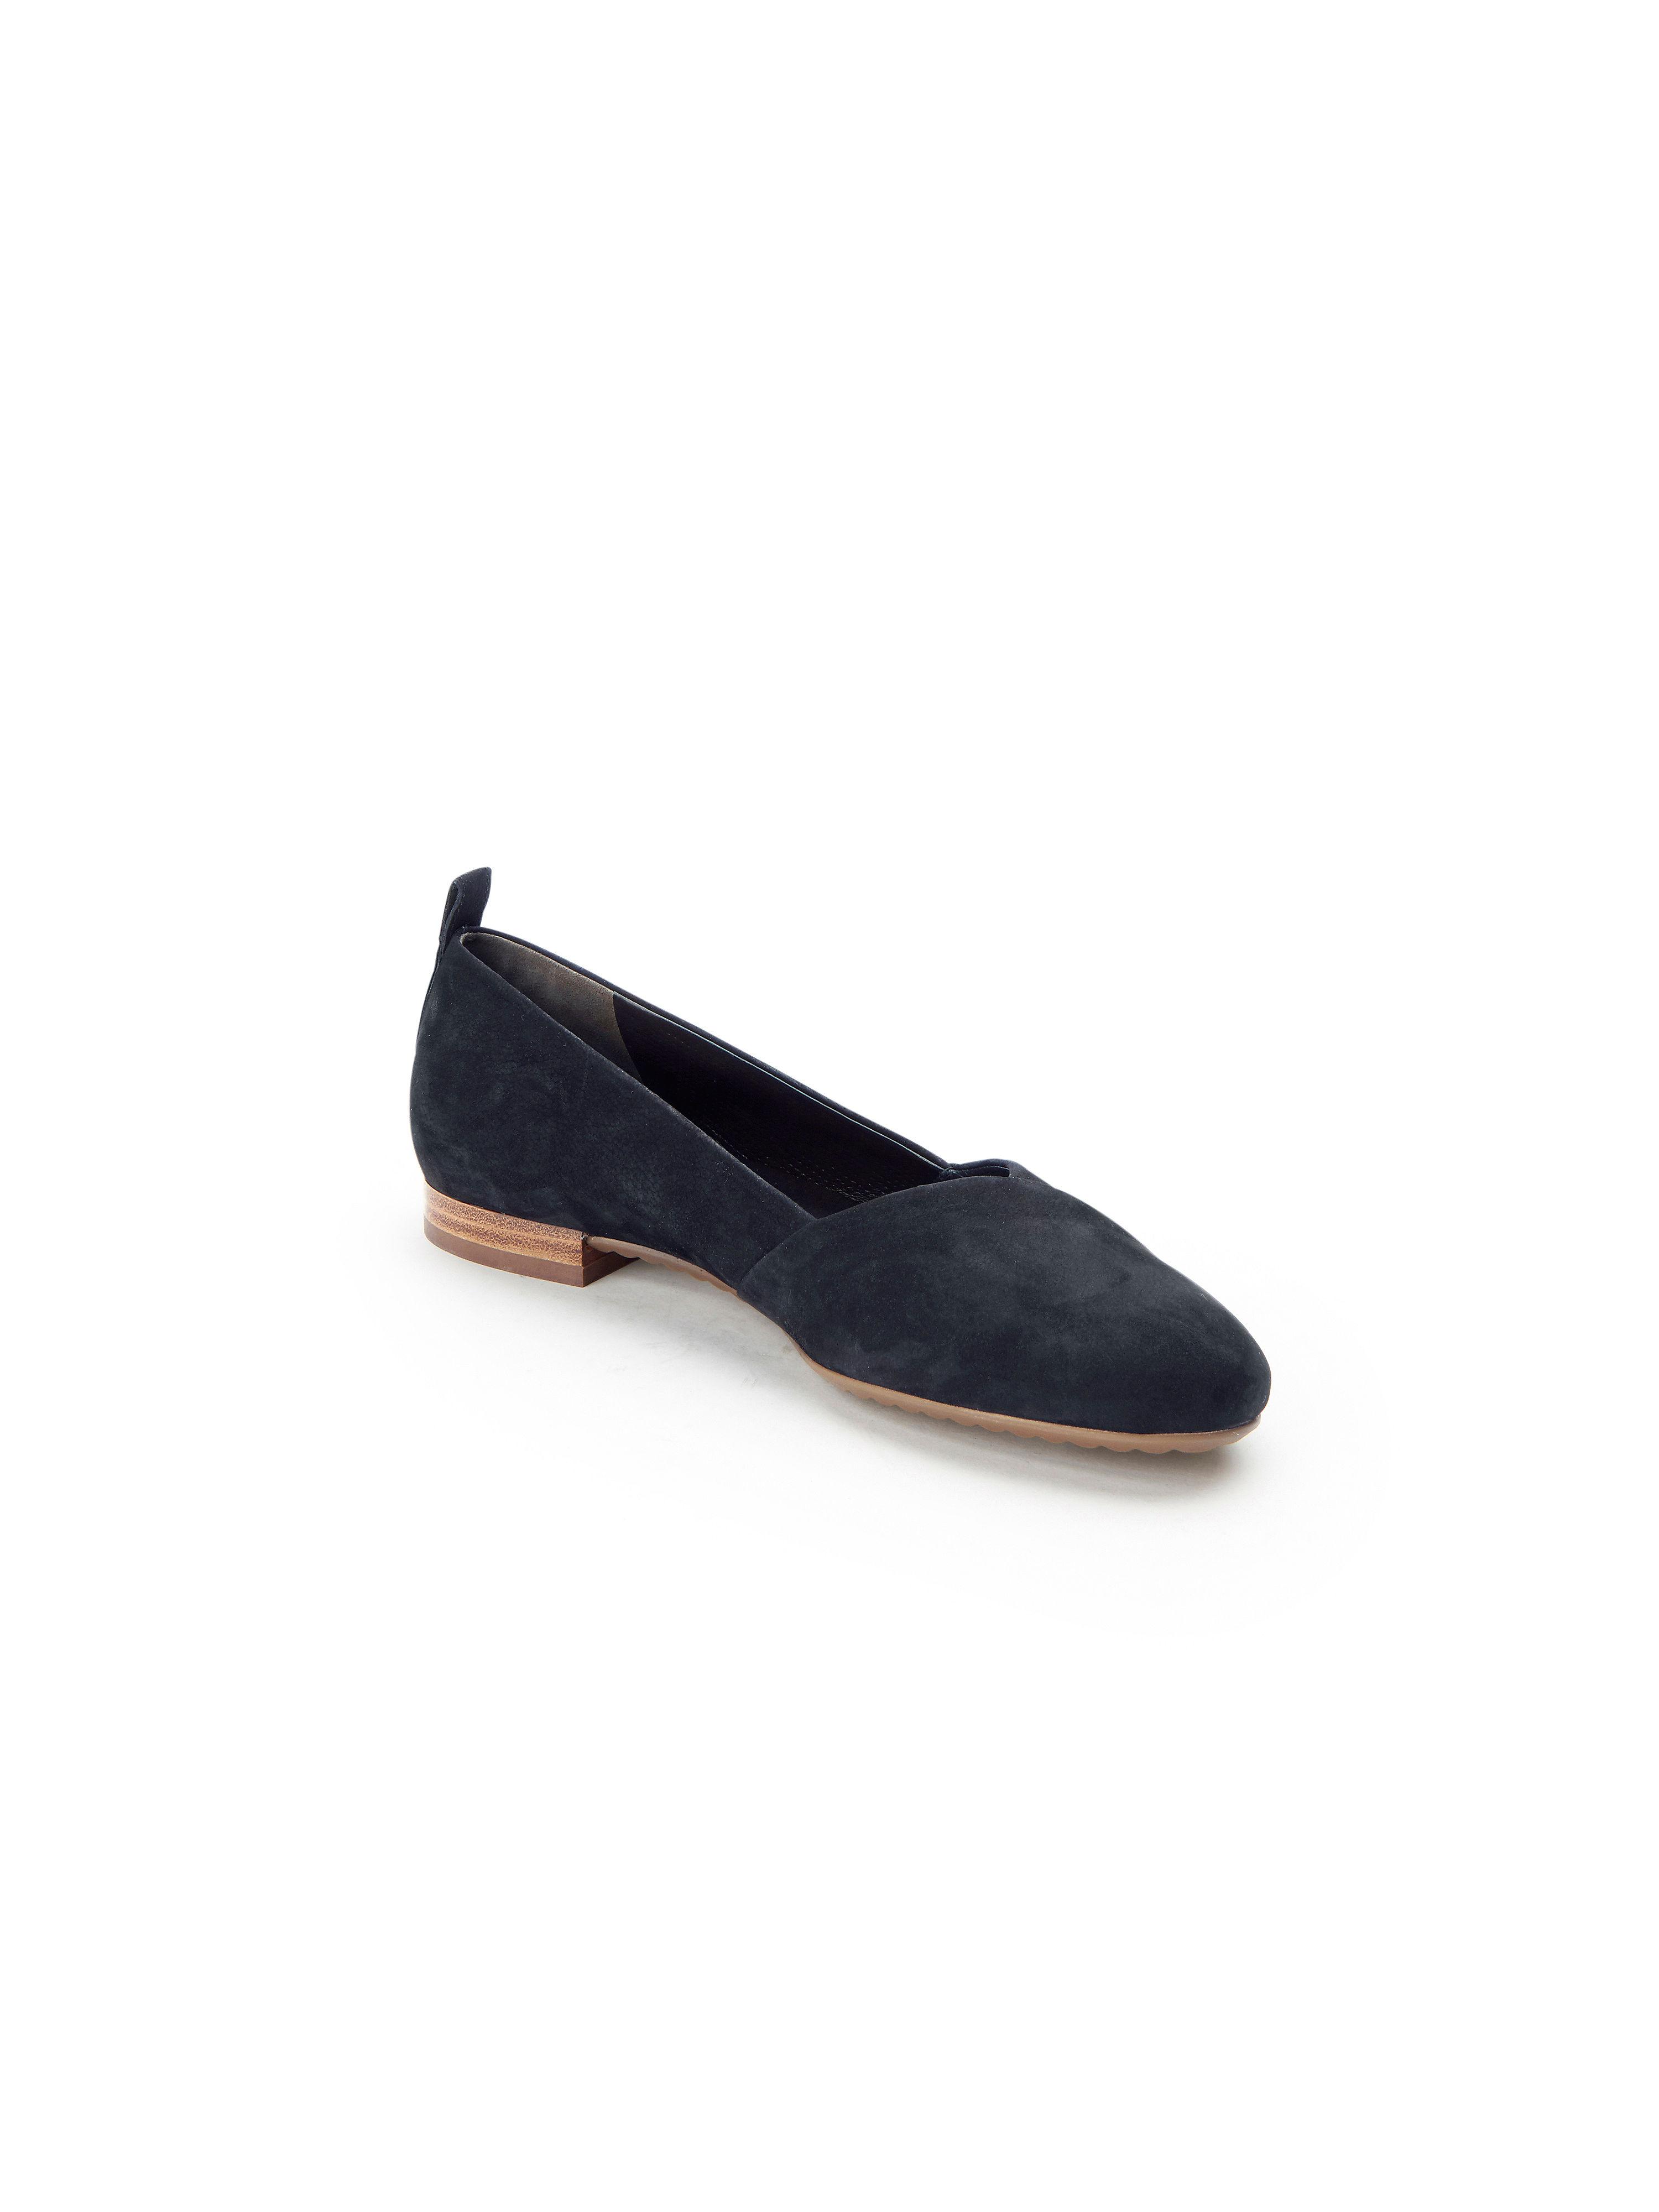 Paul Green - Ballerina aus 100% Leder - Schwarz Gute Qualität beliebte Schuhe